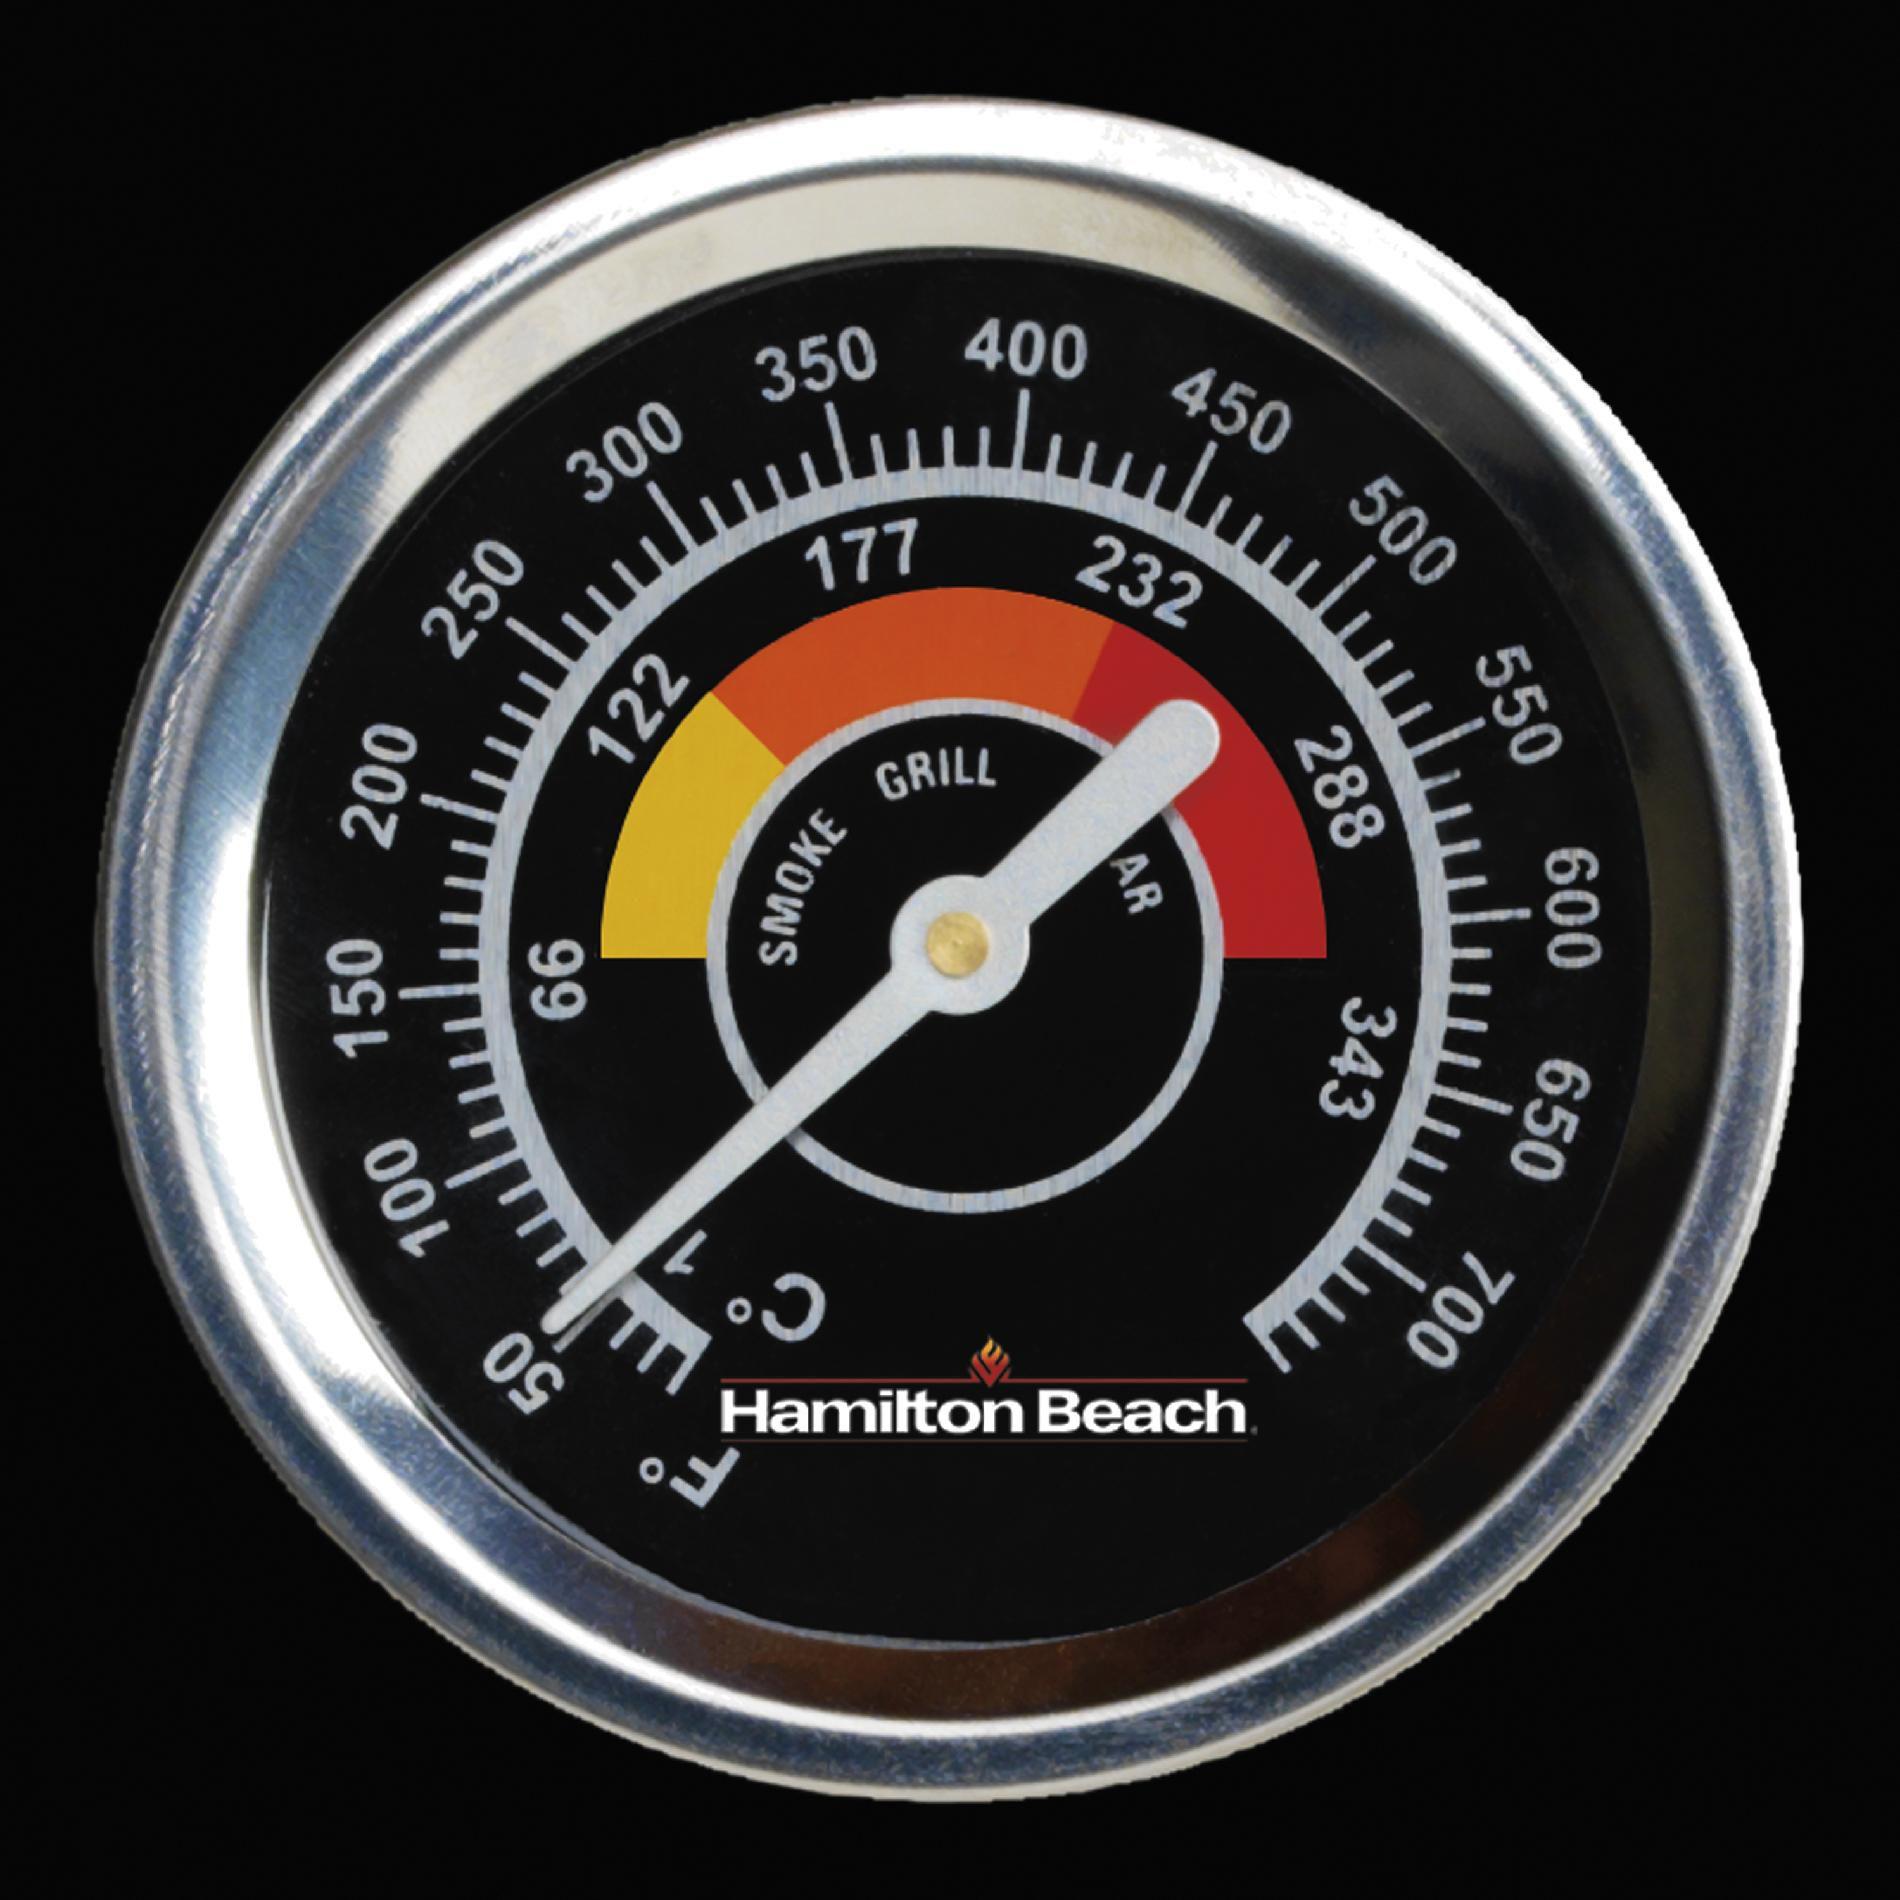 Hamilton Beach 4-Burner GrillStation™ Gas Grill